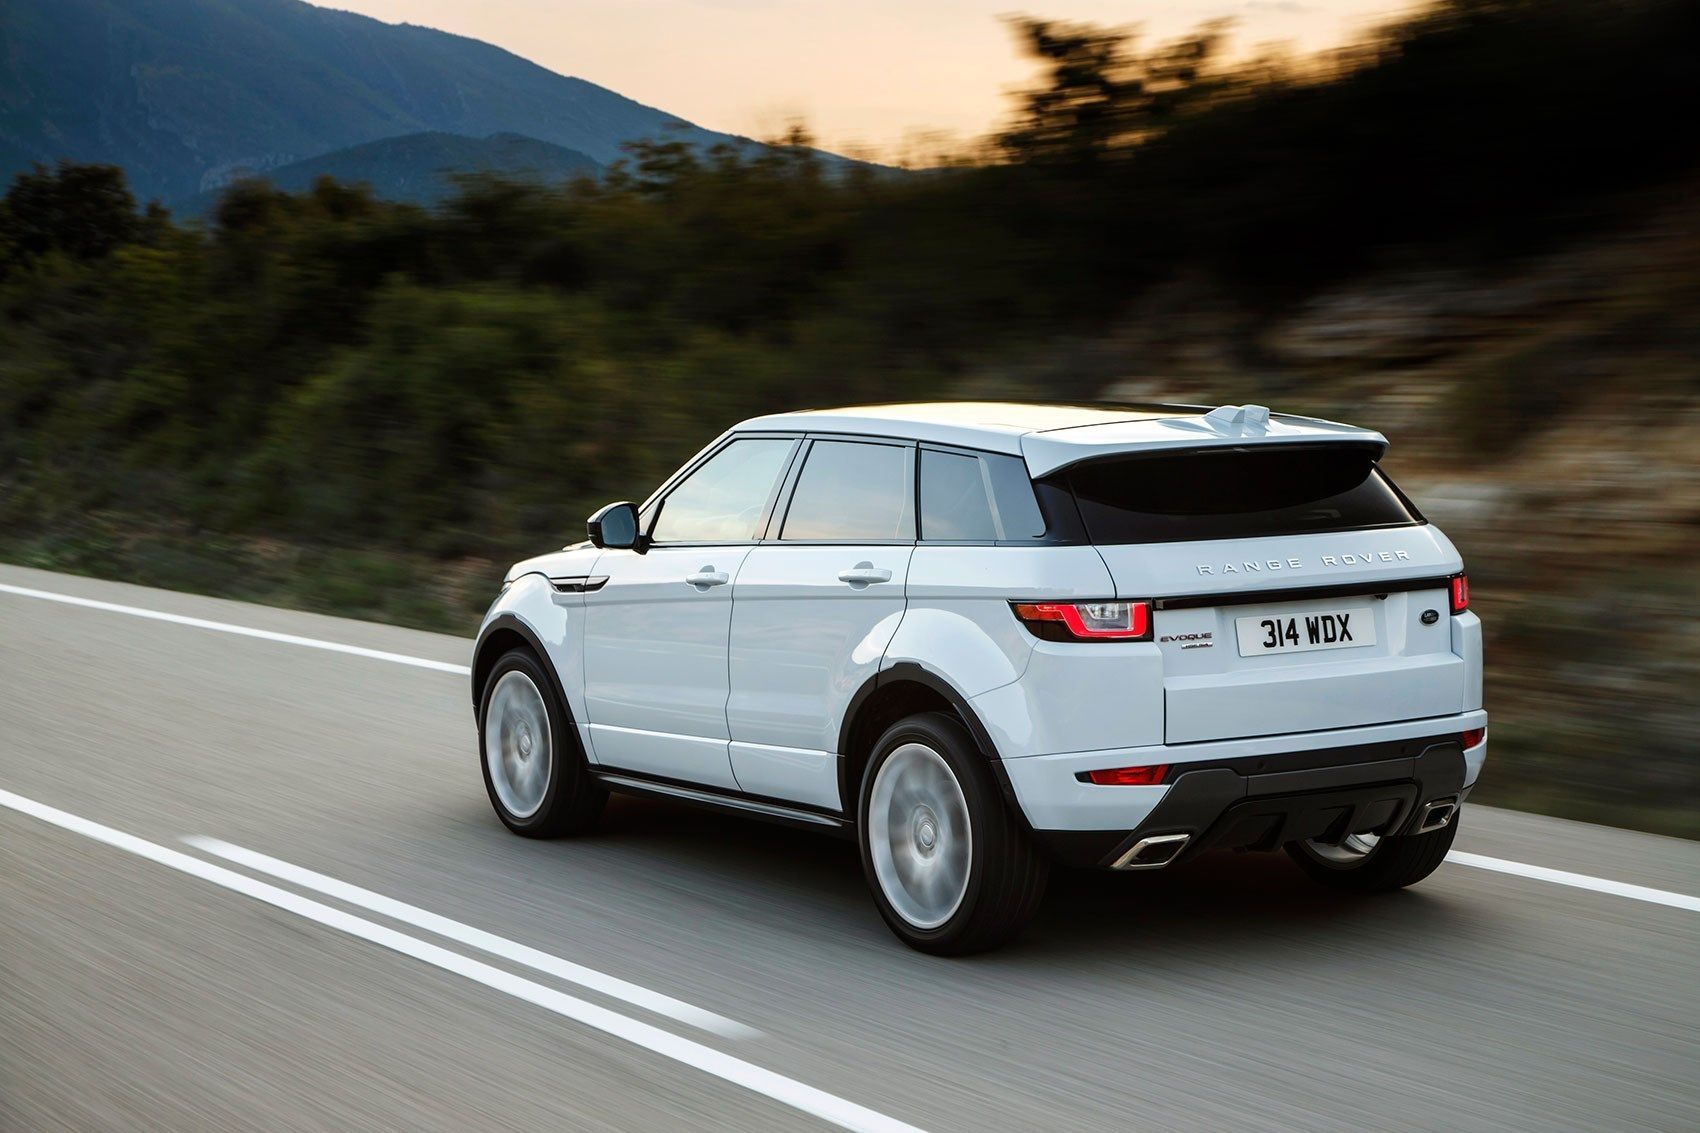 Range Rover Evoque 2018 Price Spesification Range rover